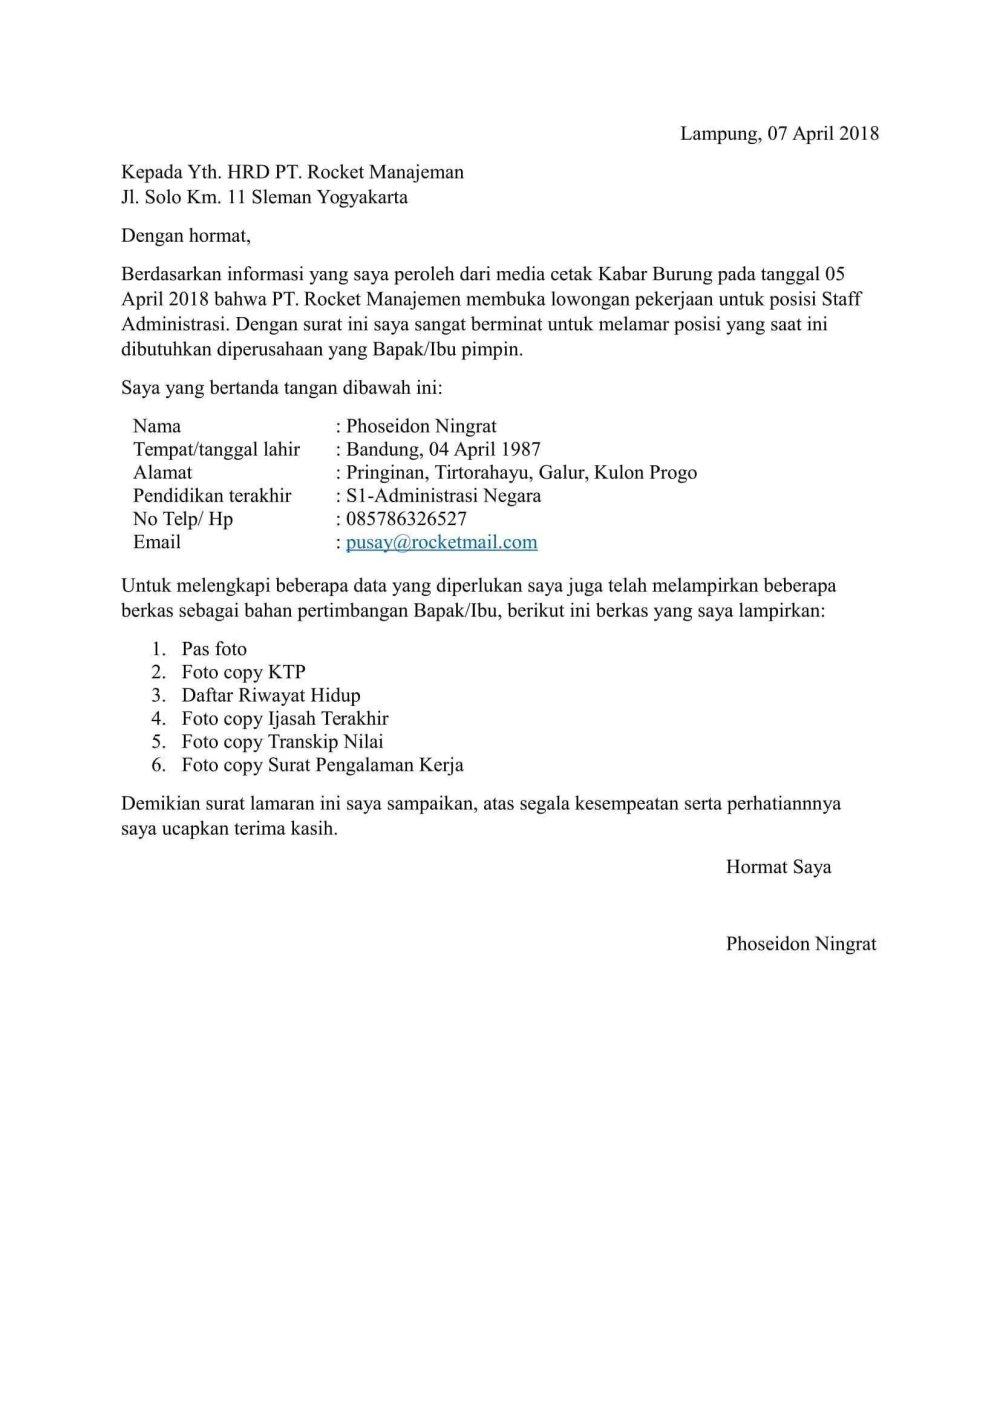 35 Contoh Surat Lamaran Kerja 2020 Berbagai Posisi Contoh Surat